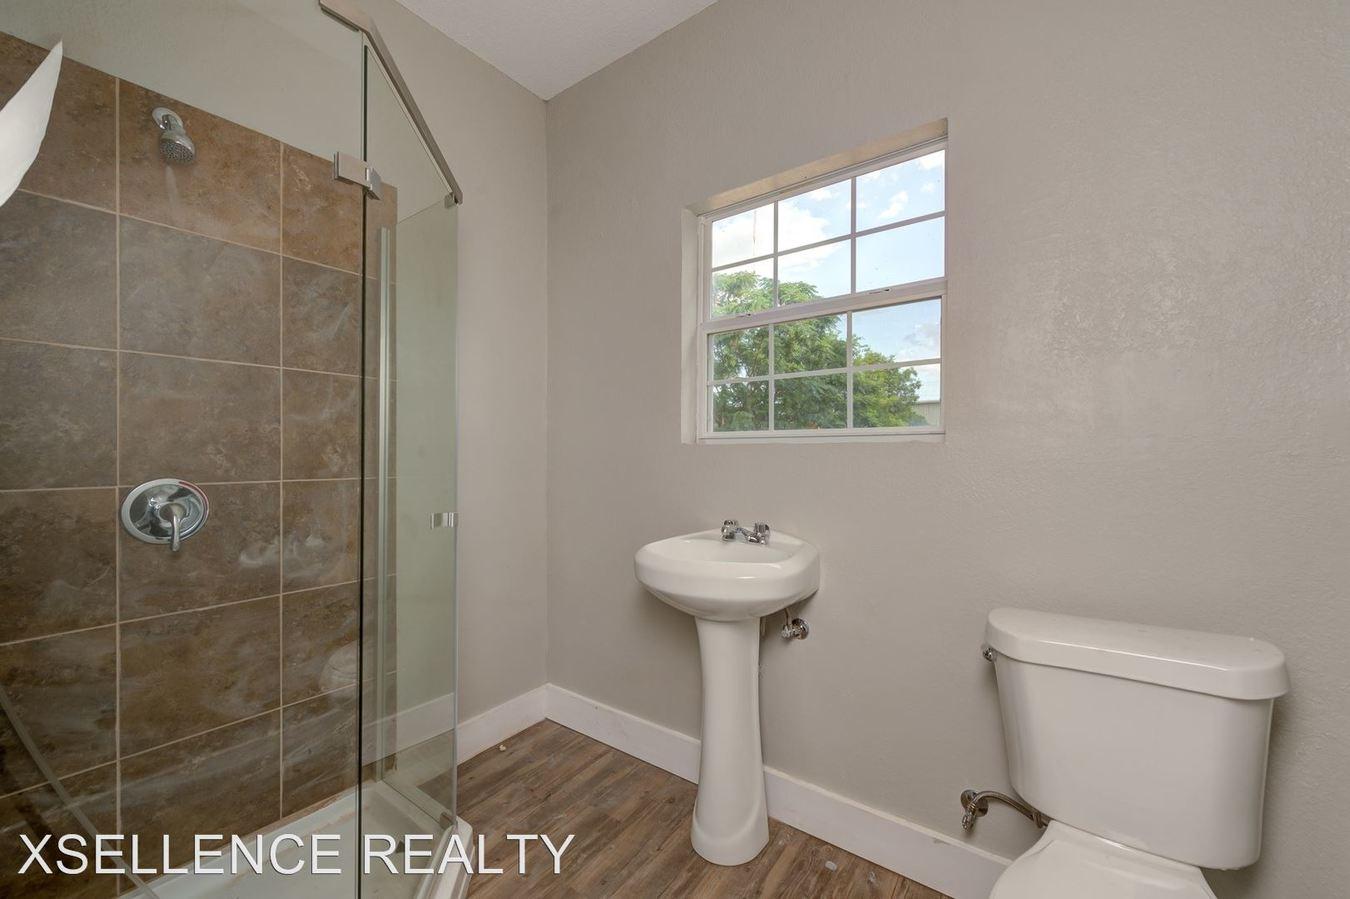 1 Bedroom 1 Bathroom Apartment for rent at 116 Cornell in San Antonio, TX